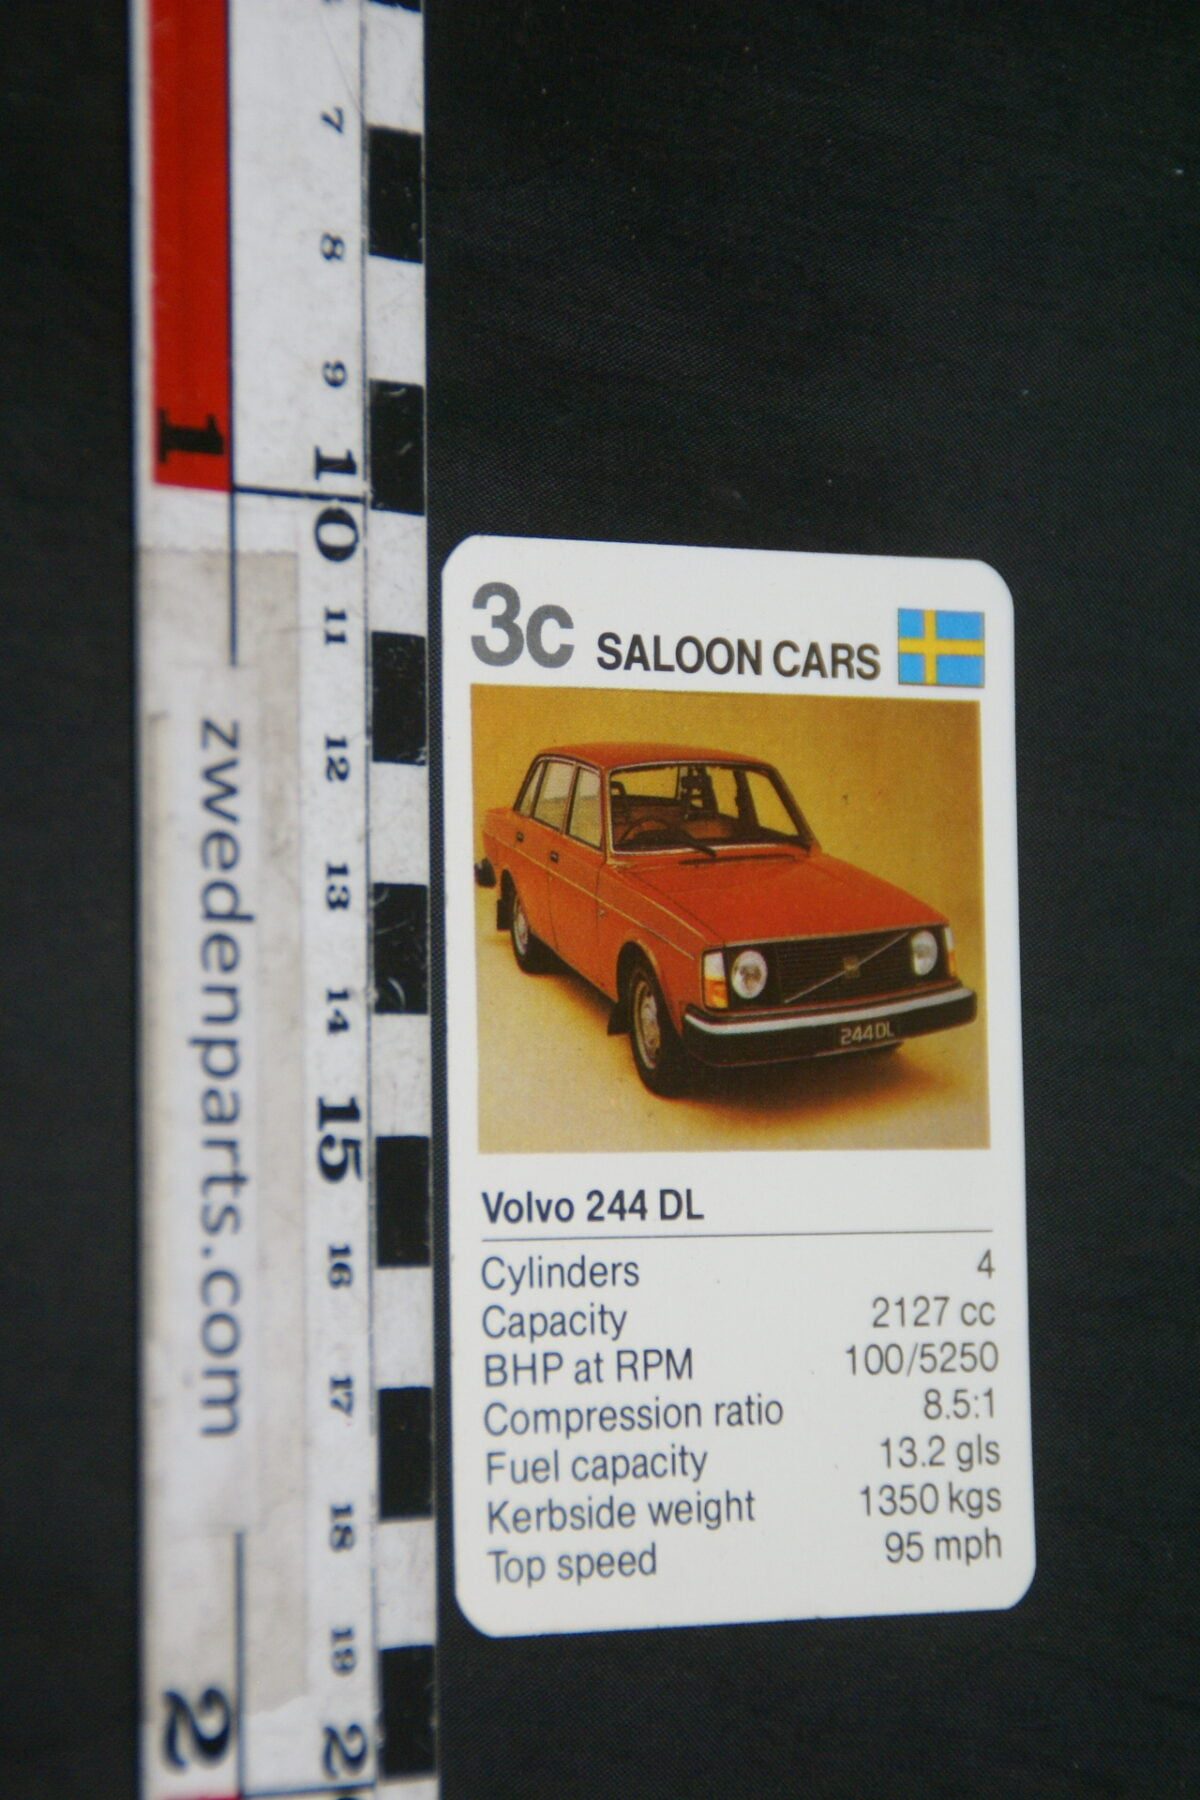 DSC02309 ca. 1976 origineel autokwartetkaart Volvo 244DL-008bef24